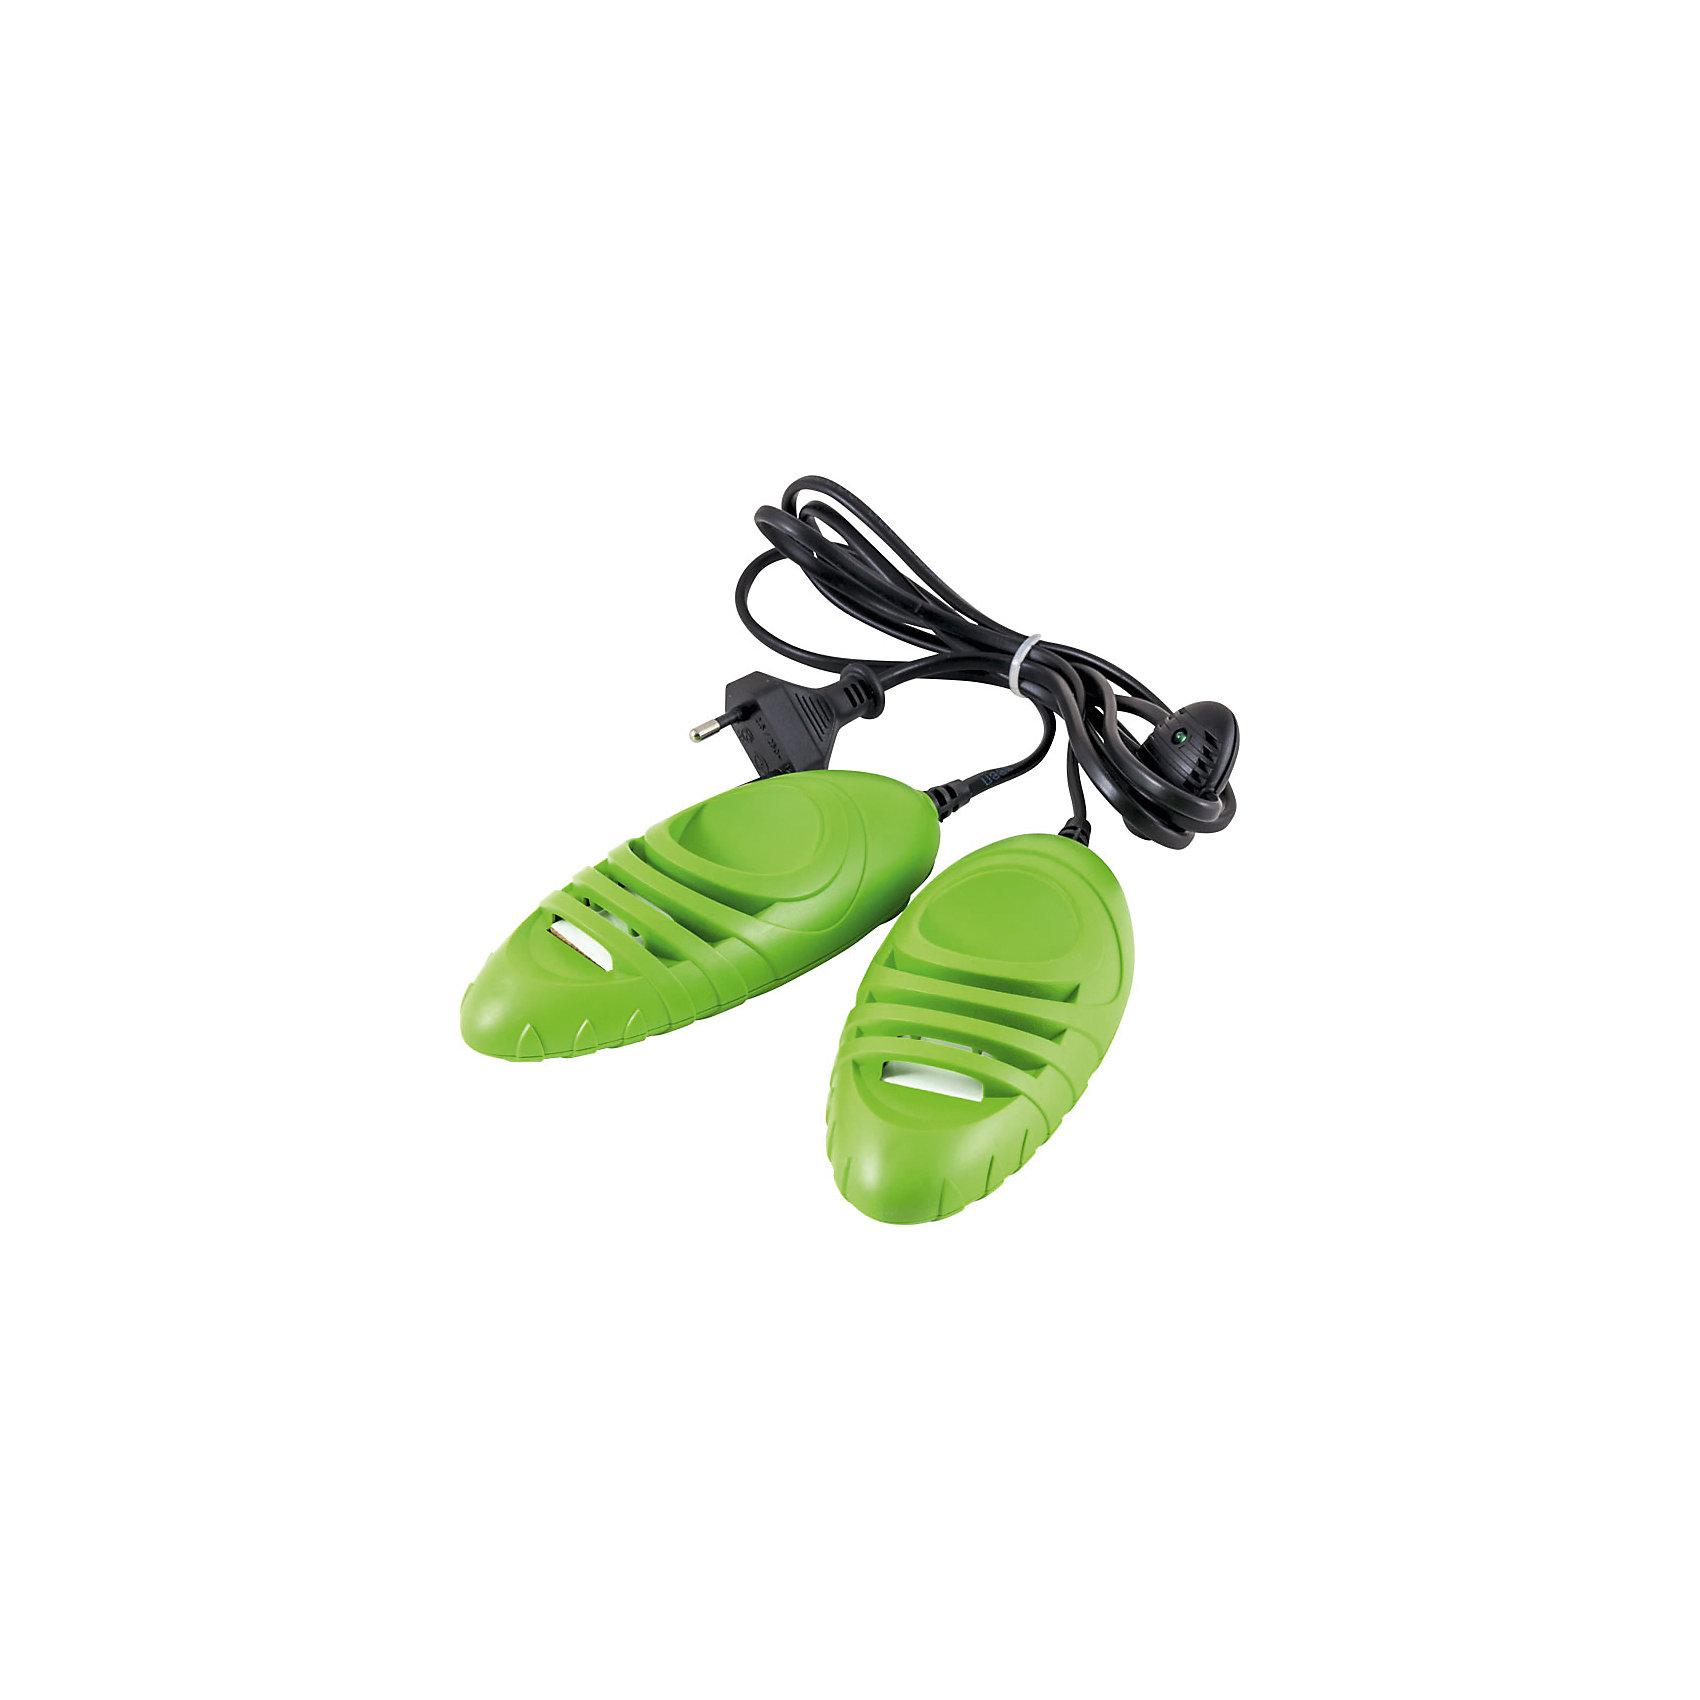 Сушилка для обуви «Комфорт Люкс», Комфорт